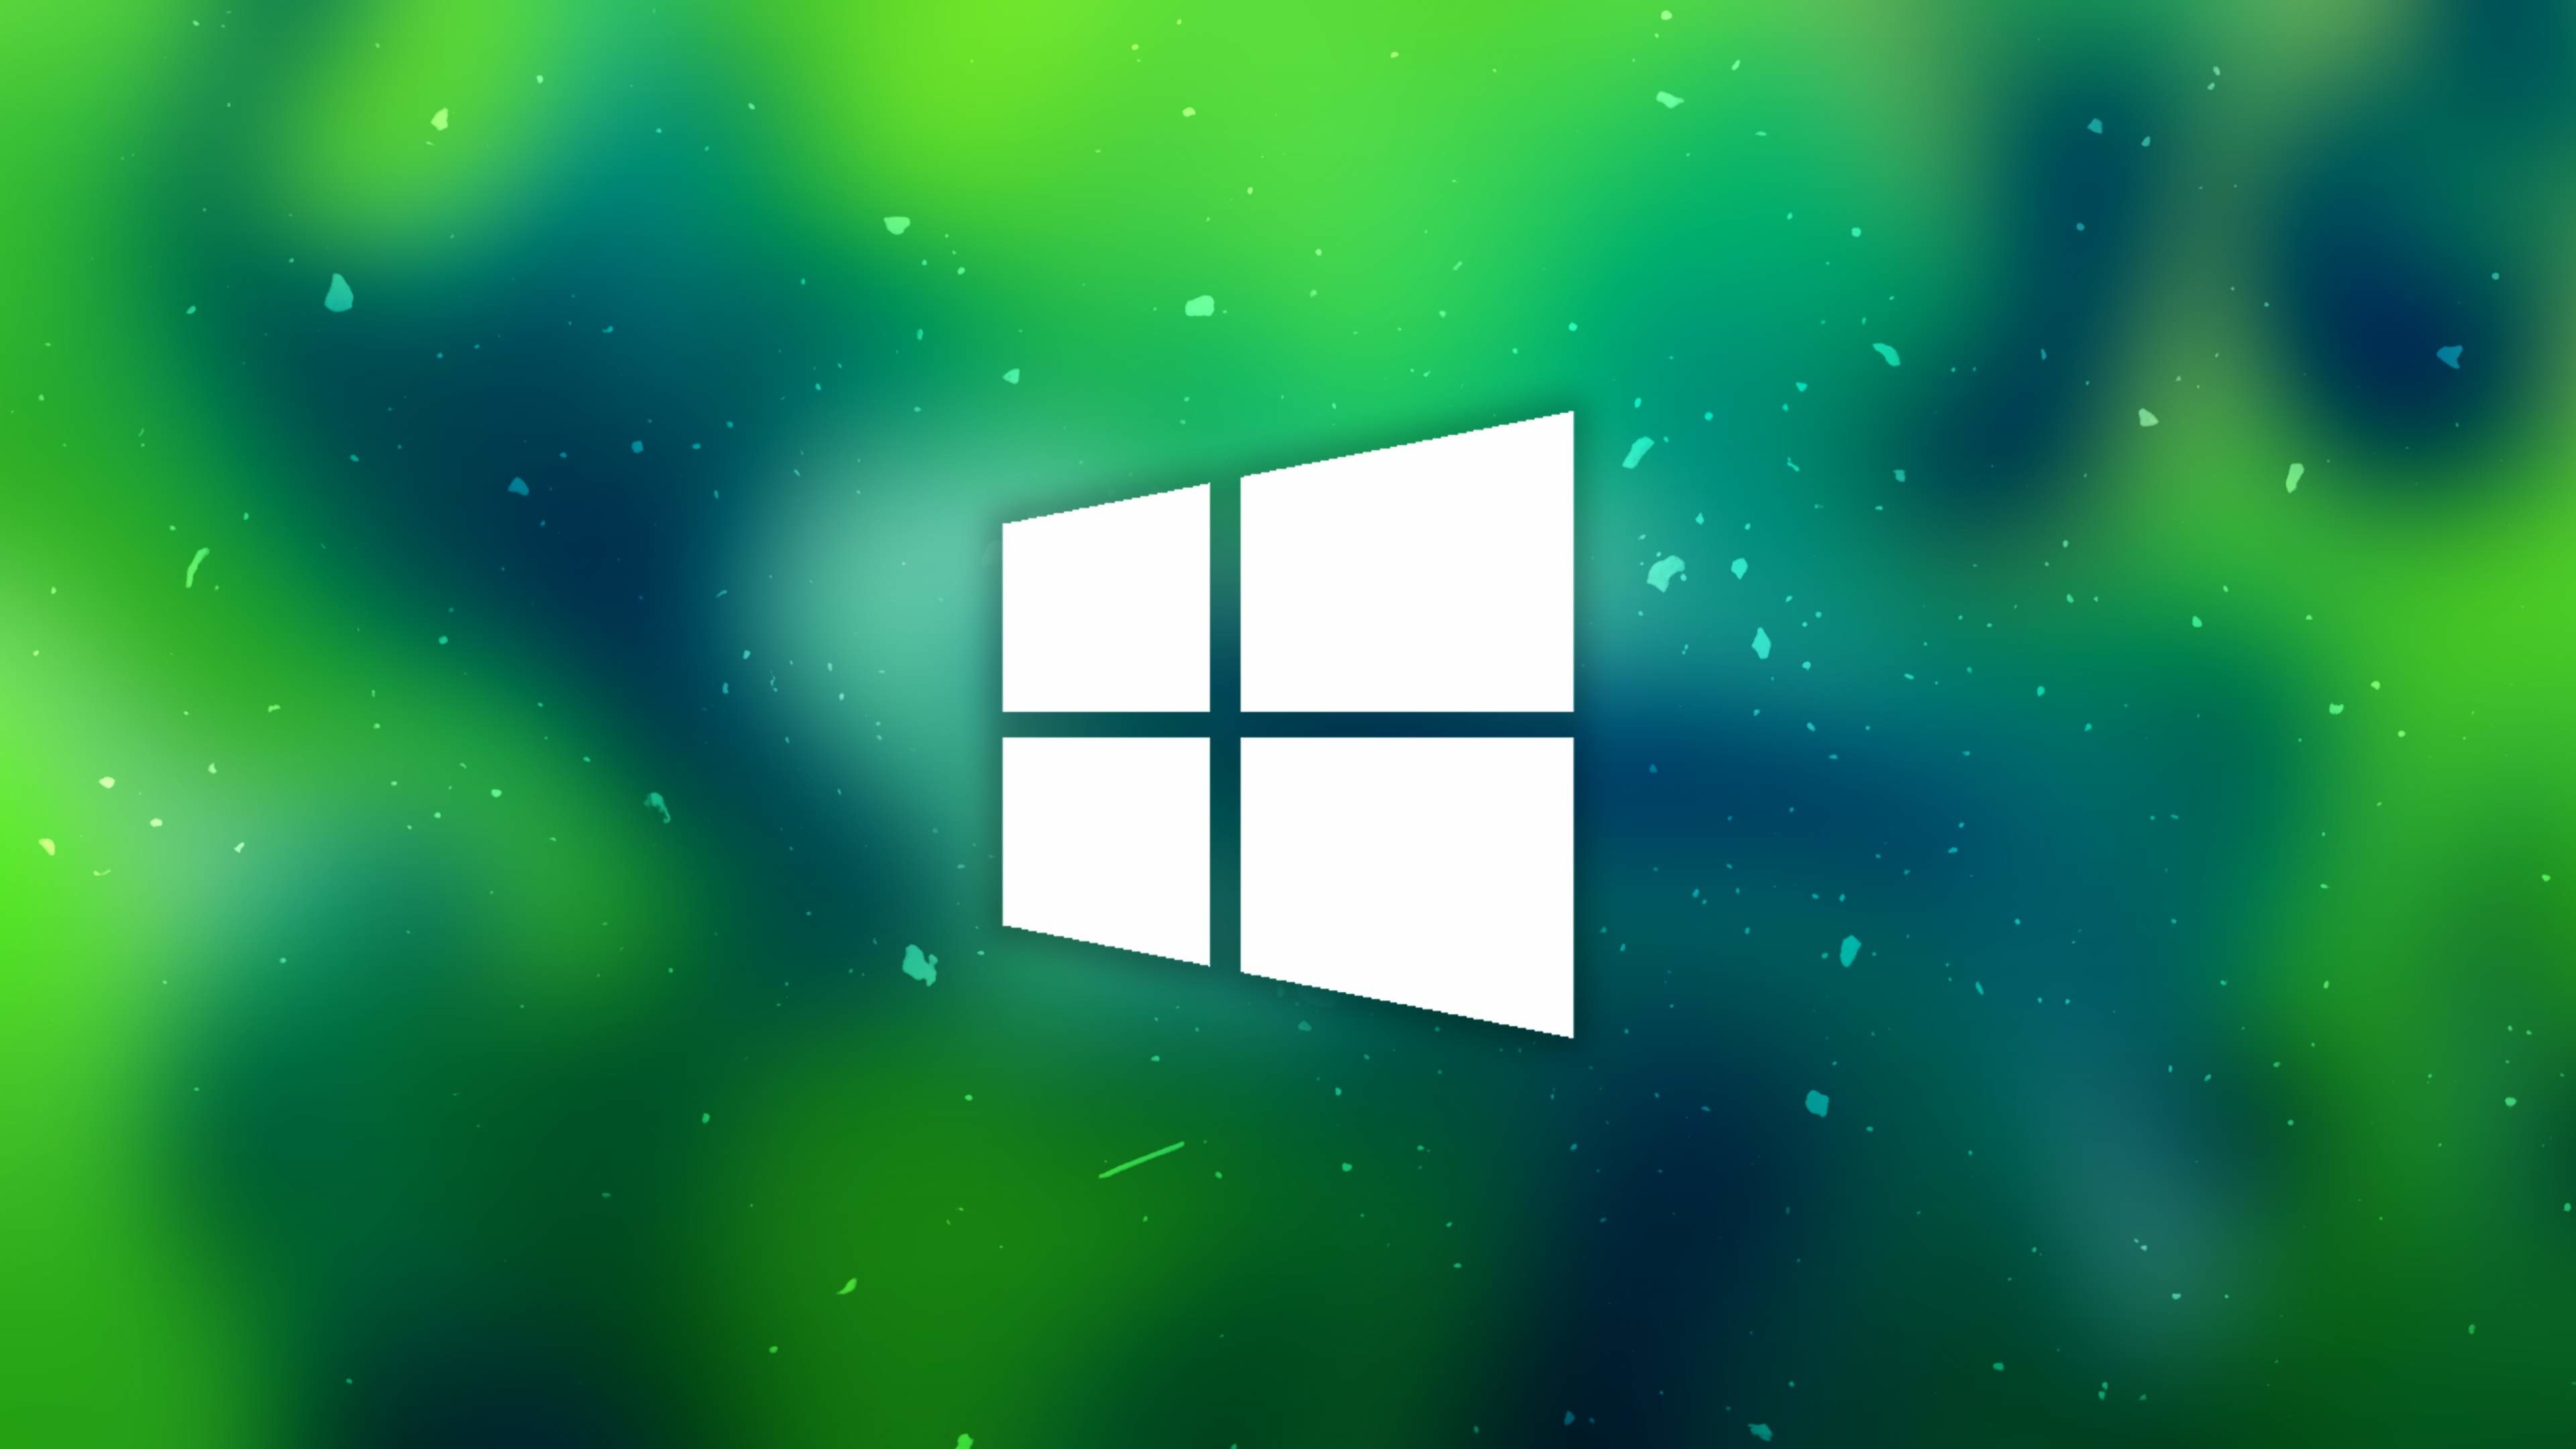 Windows 10 Green Wallpaper 71 Images